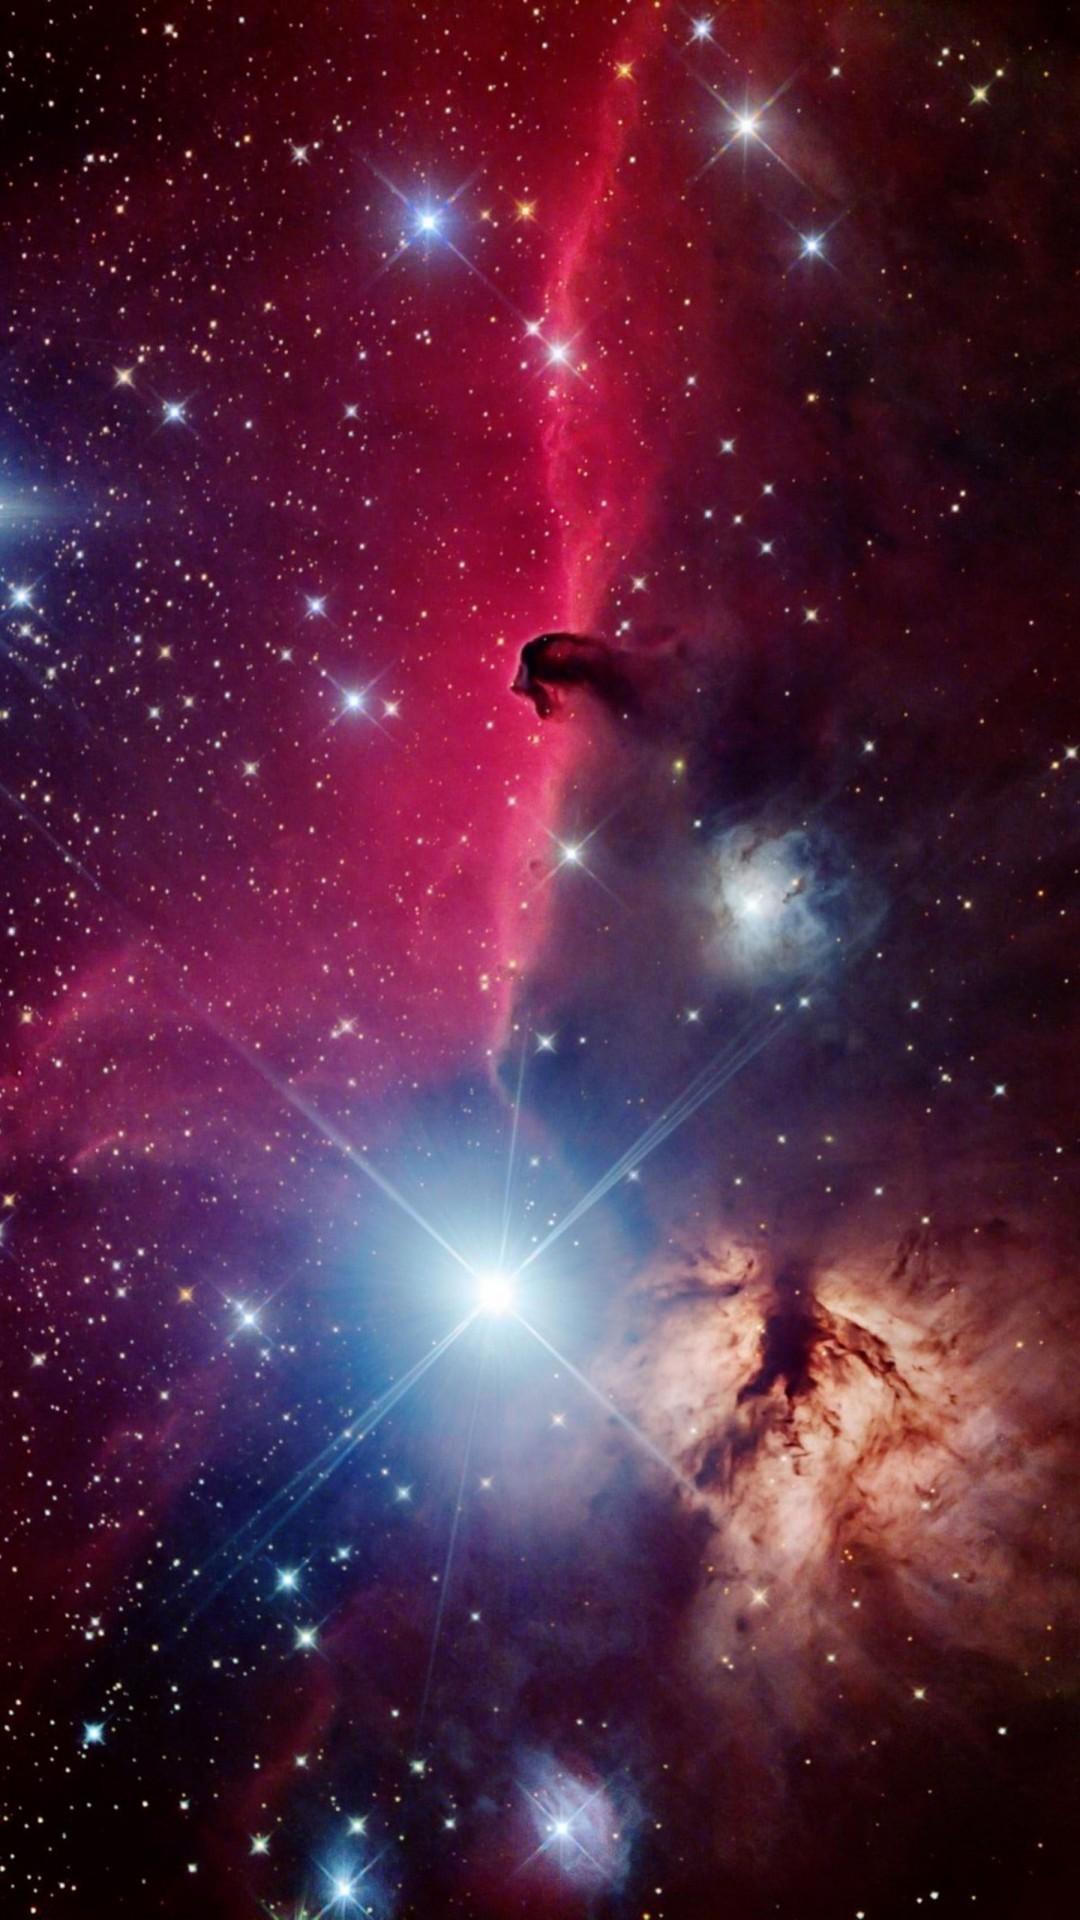 Eagle nebula wallpaper 67 pictures - 1080p nebula wallpaper ...